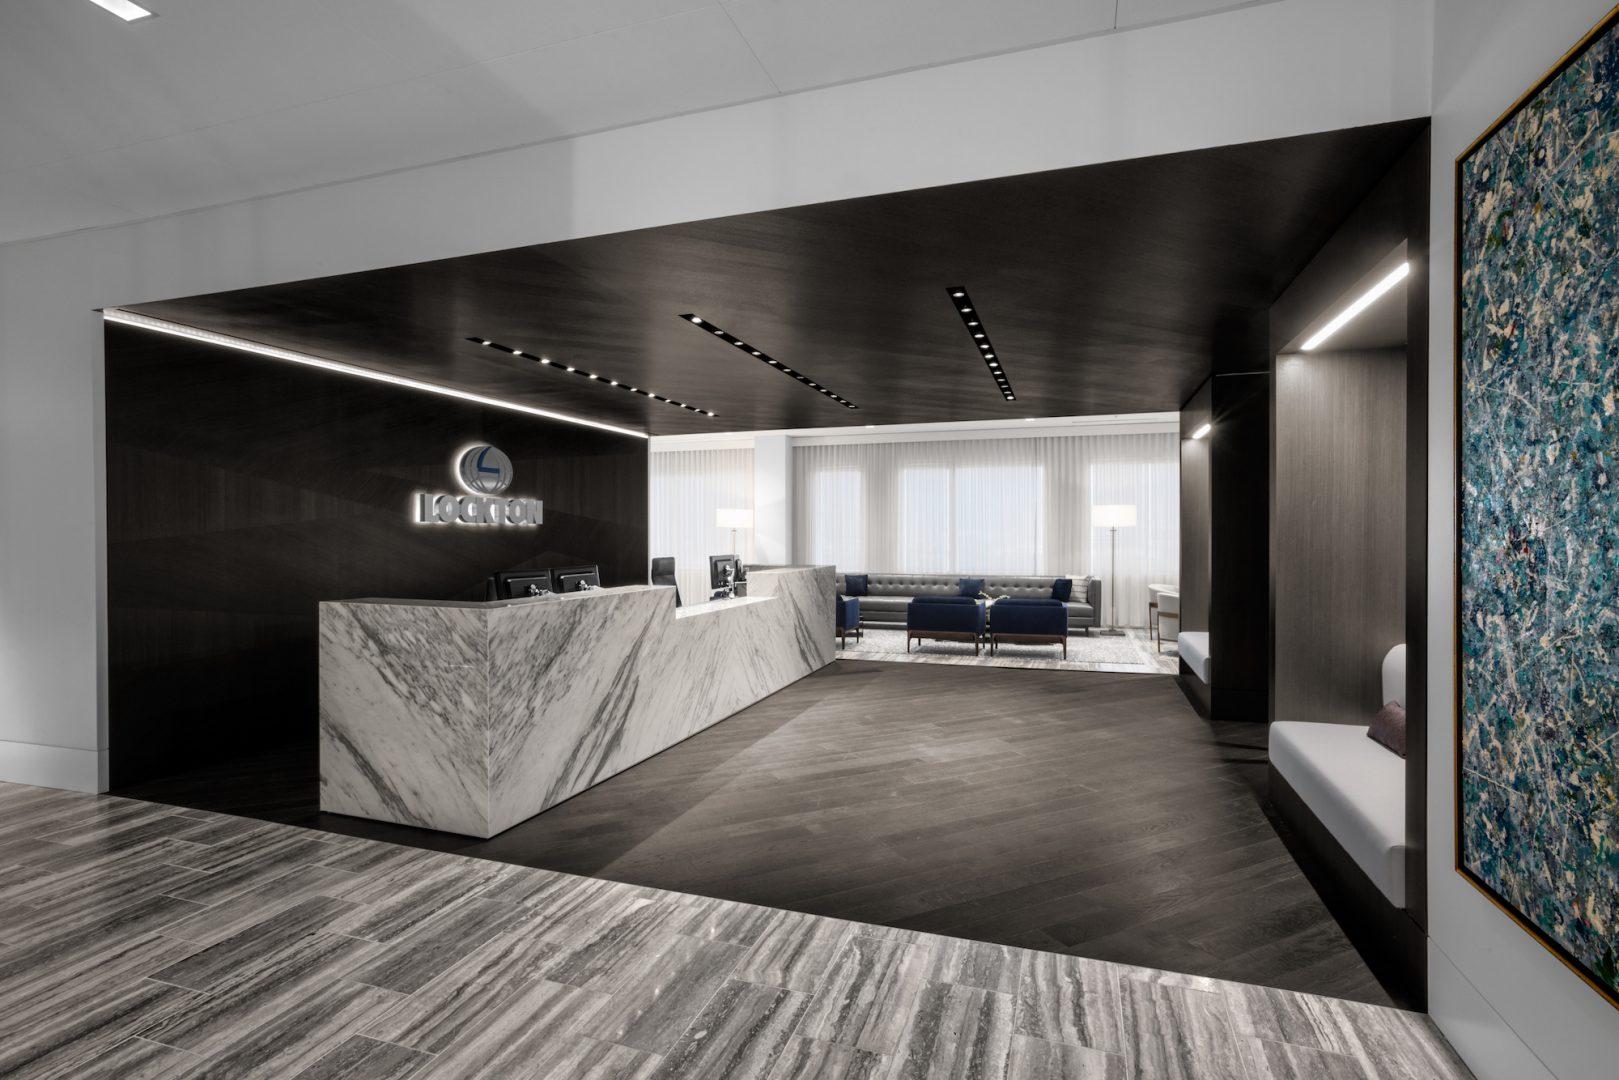 Corporate Interior Design Lockton Houston Reception Entrance Lobby Dark Wood Marble